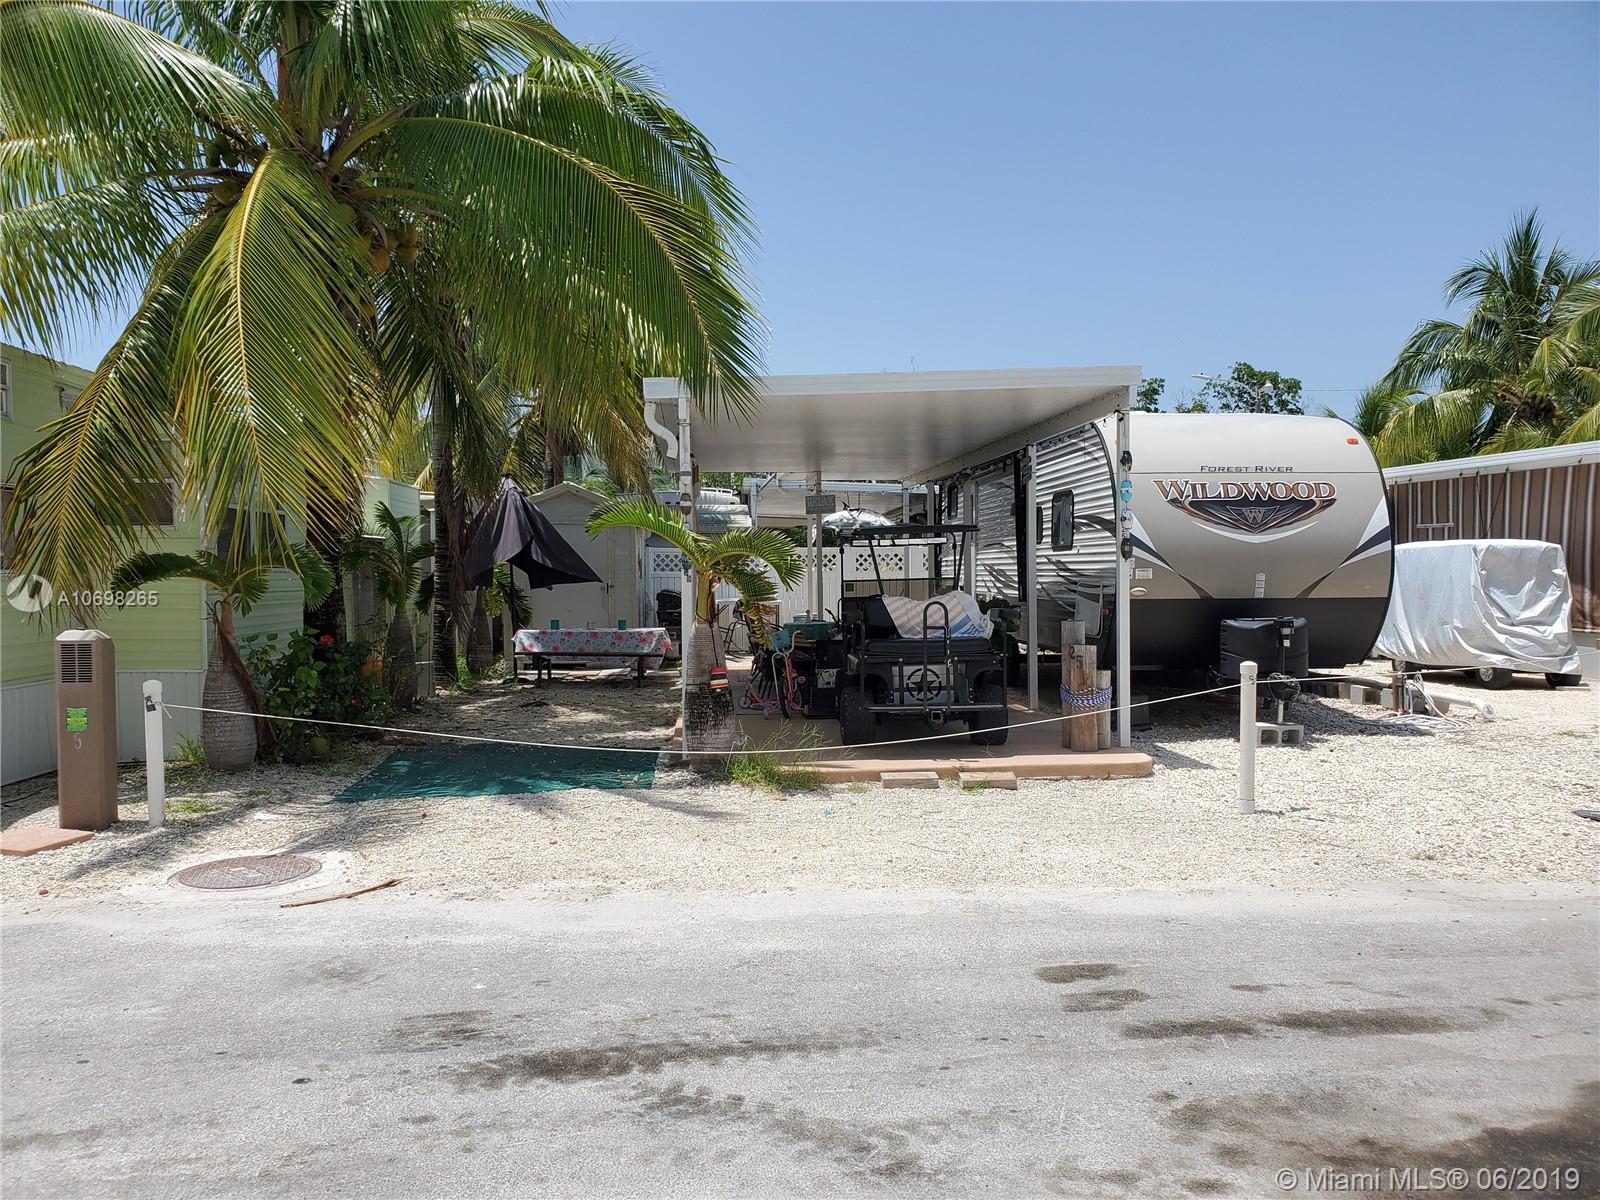 325 Calusa Street, Islands/Caribbean, FL 33037 - Islands/Caribbean, FL real estate listing